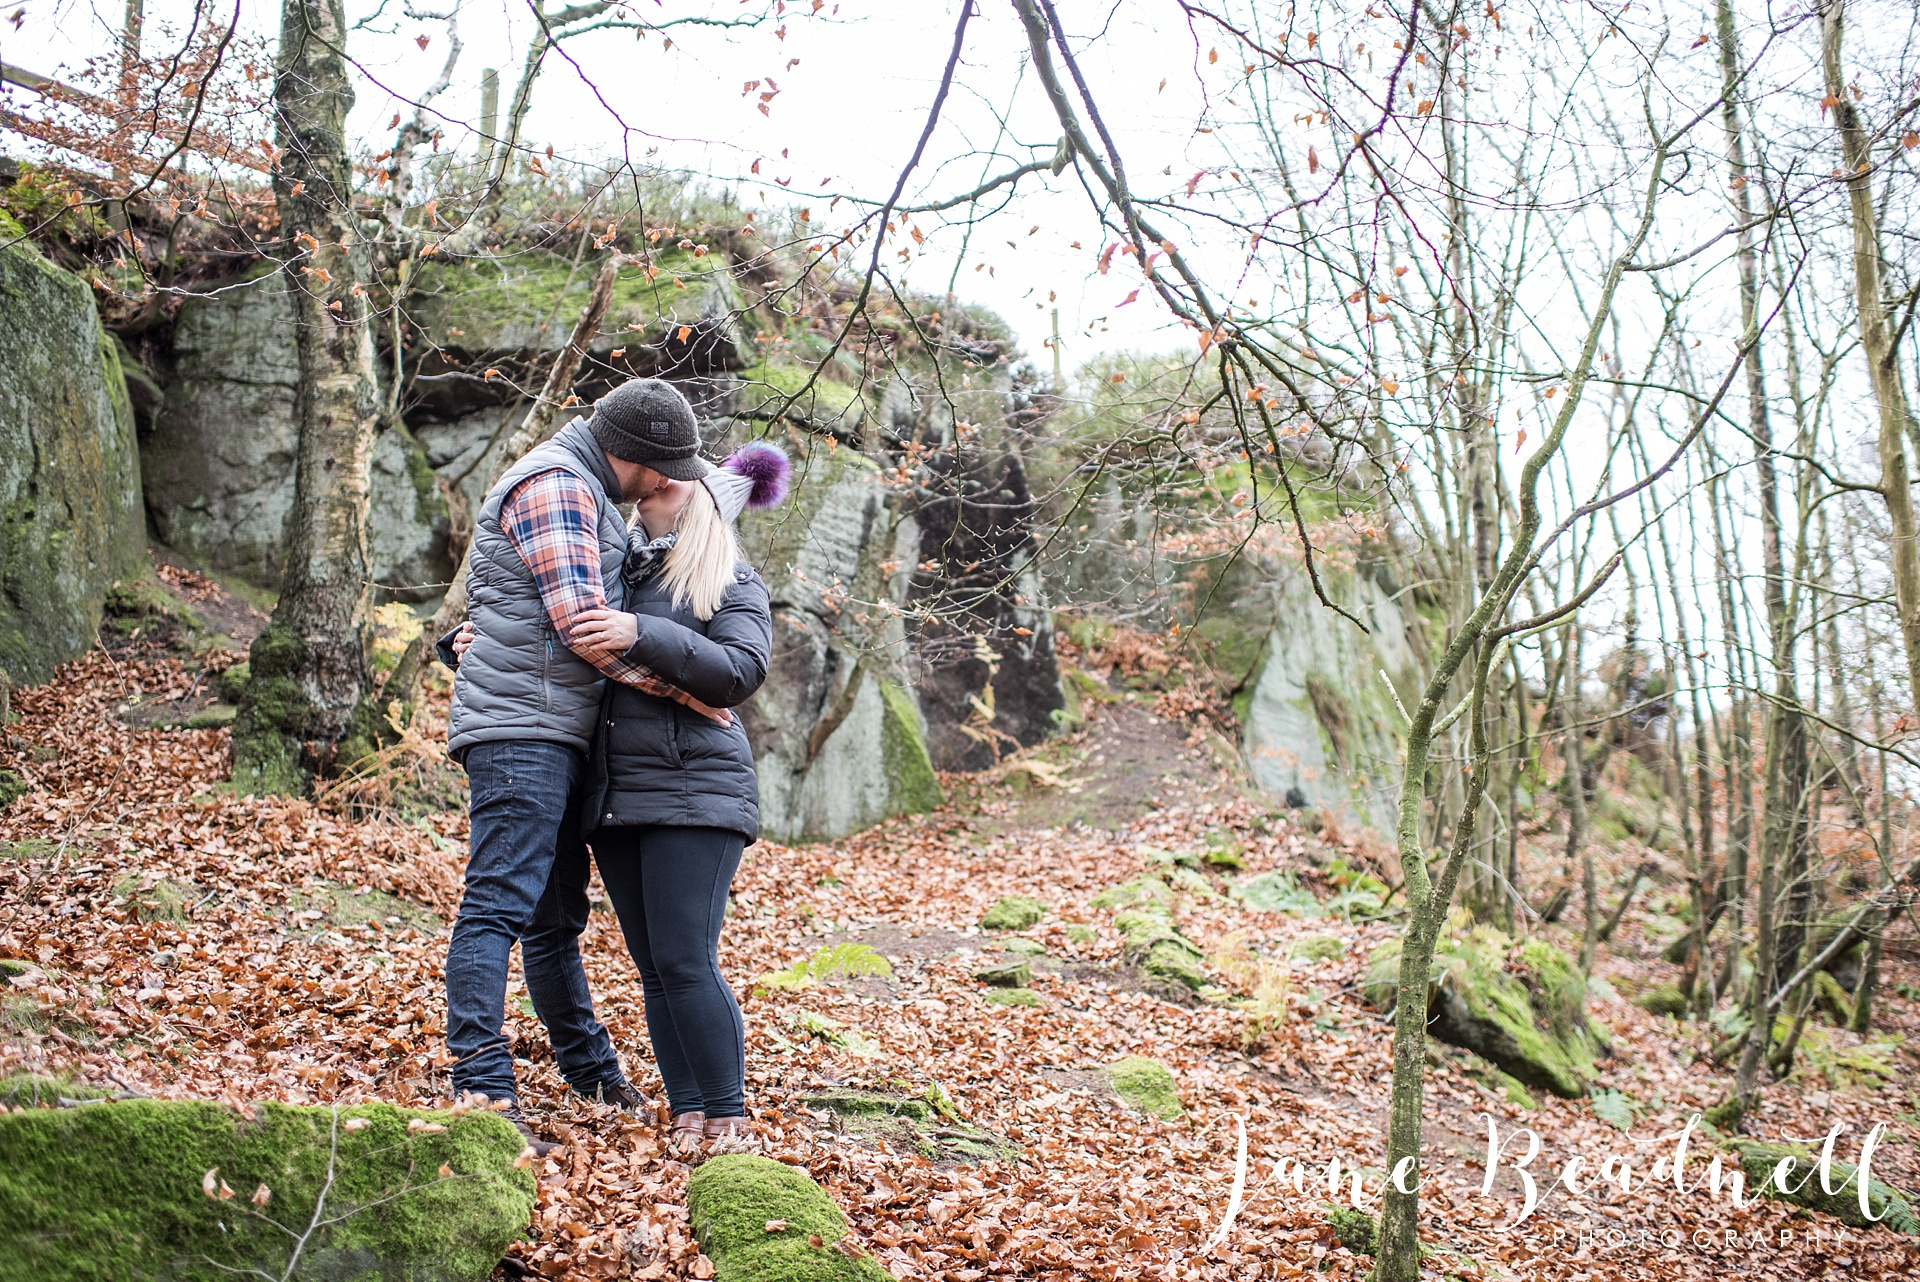 yorkshire-wedding-photographer-jane-beadnell-photography-uk-and-destination-wedding-photographer-engagement-shoot_0058